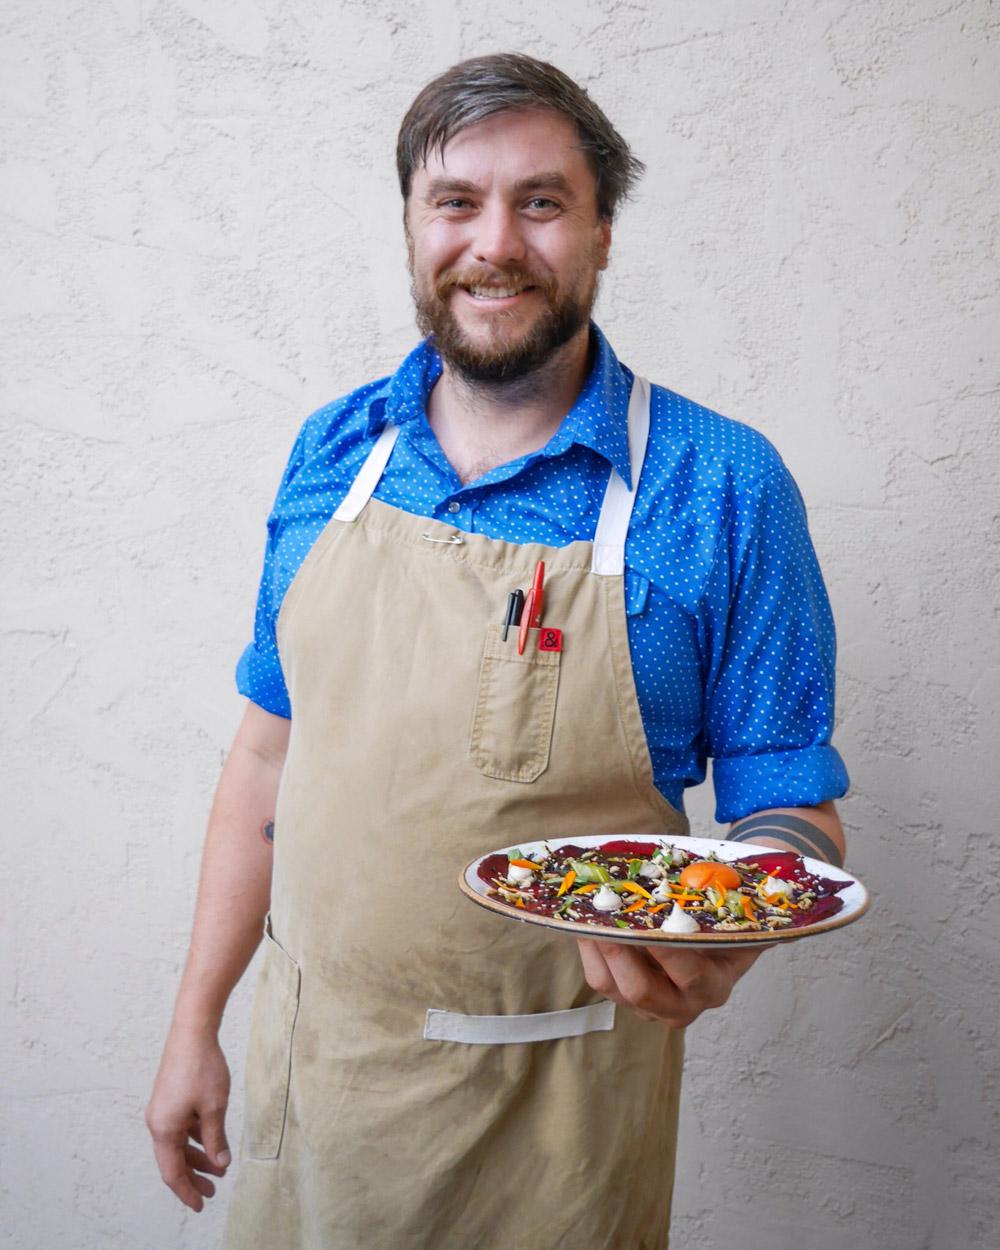 Quaintrelle, Chef de Cuisine Ryley Eckersley